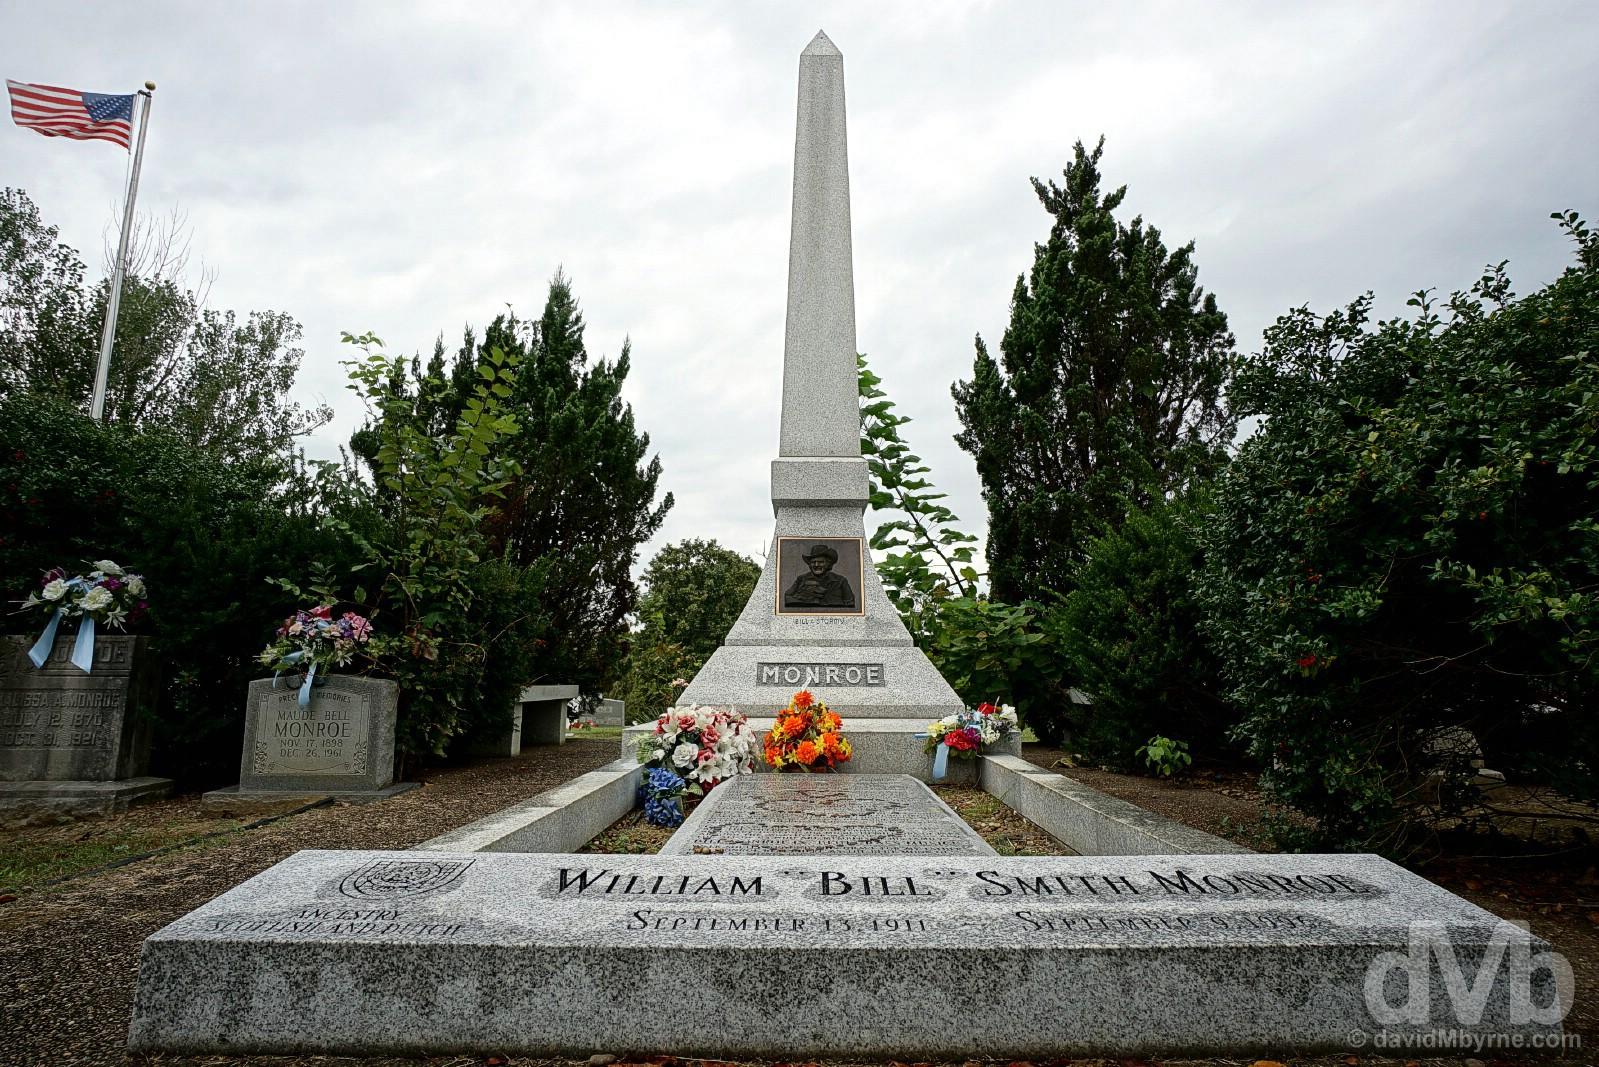 Bill Monroe's grave in the cemetery in Rosine, Ohio County, Kentucky, USA. September 28, 2016.